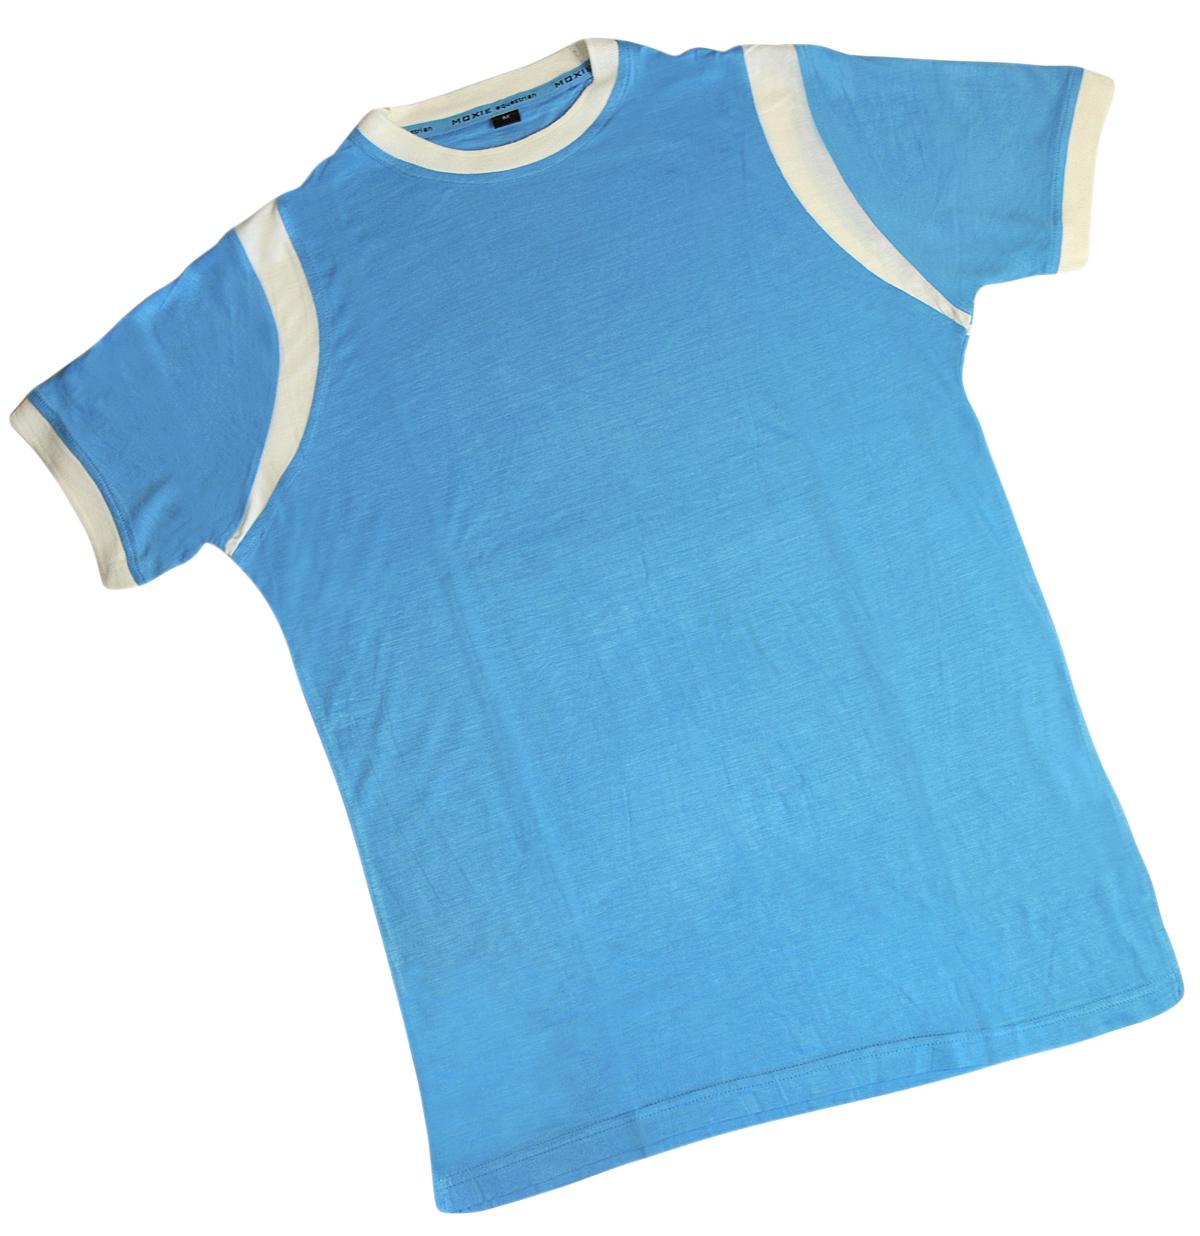 Moxie Men's Tee Shirt